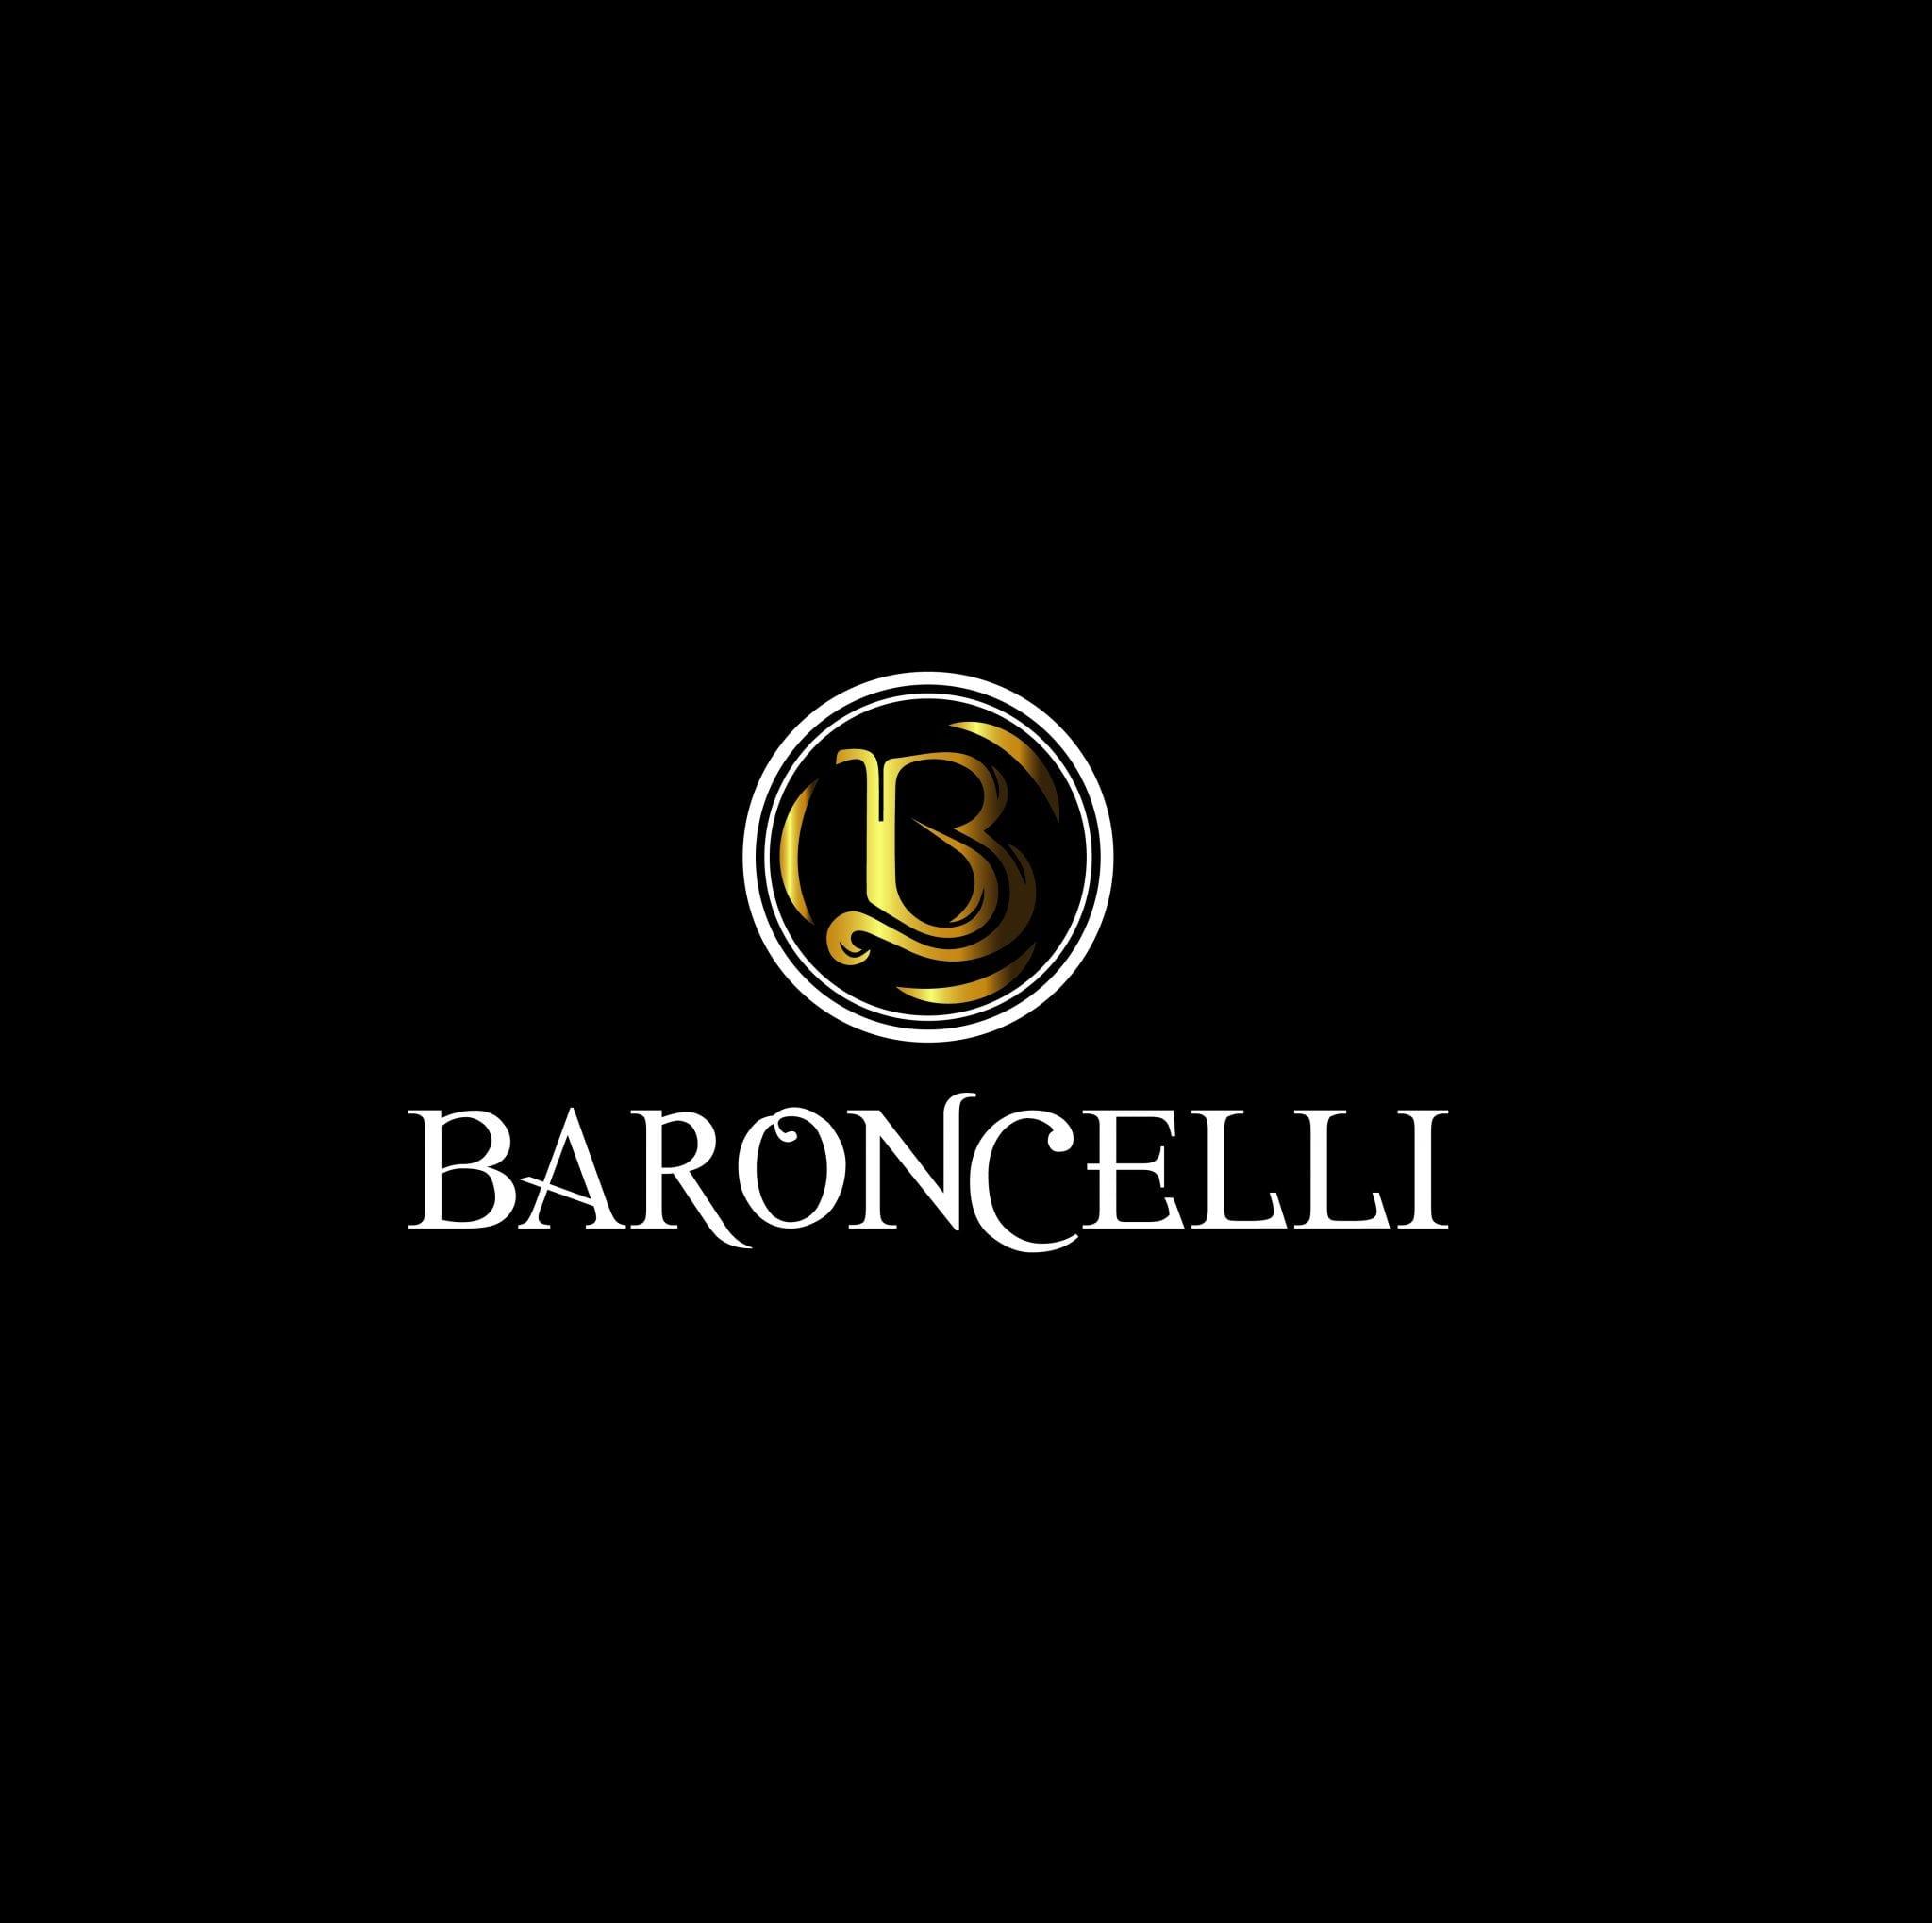 LOGO BARONCELLI final black